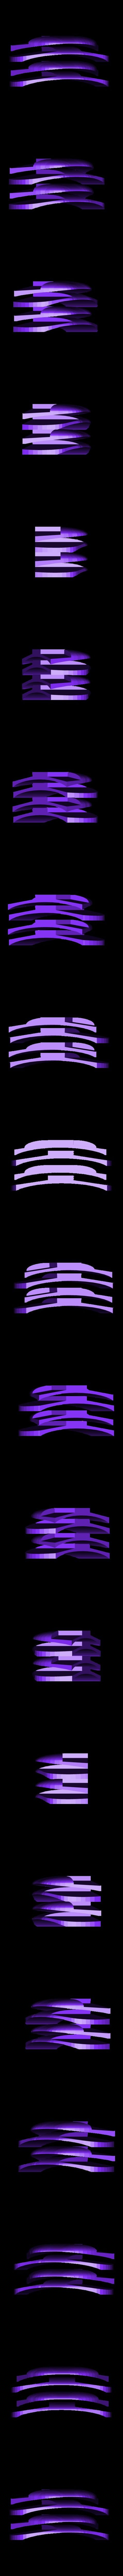 Shoretrooper_hand_guards.stl Download free STL file Shoretrooper armor parts • 3D print object, Zippityboomba